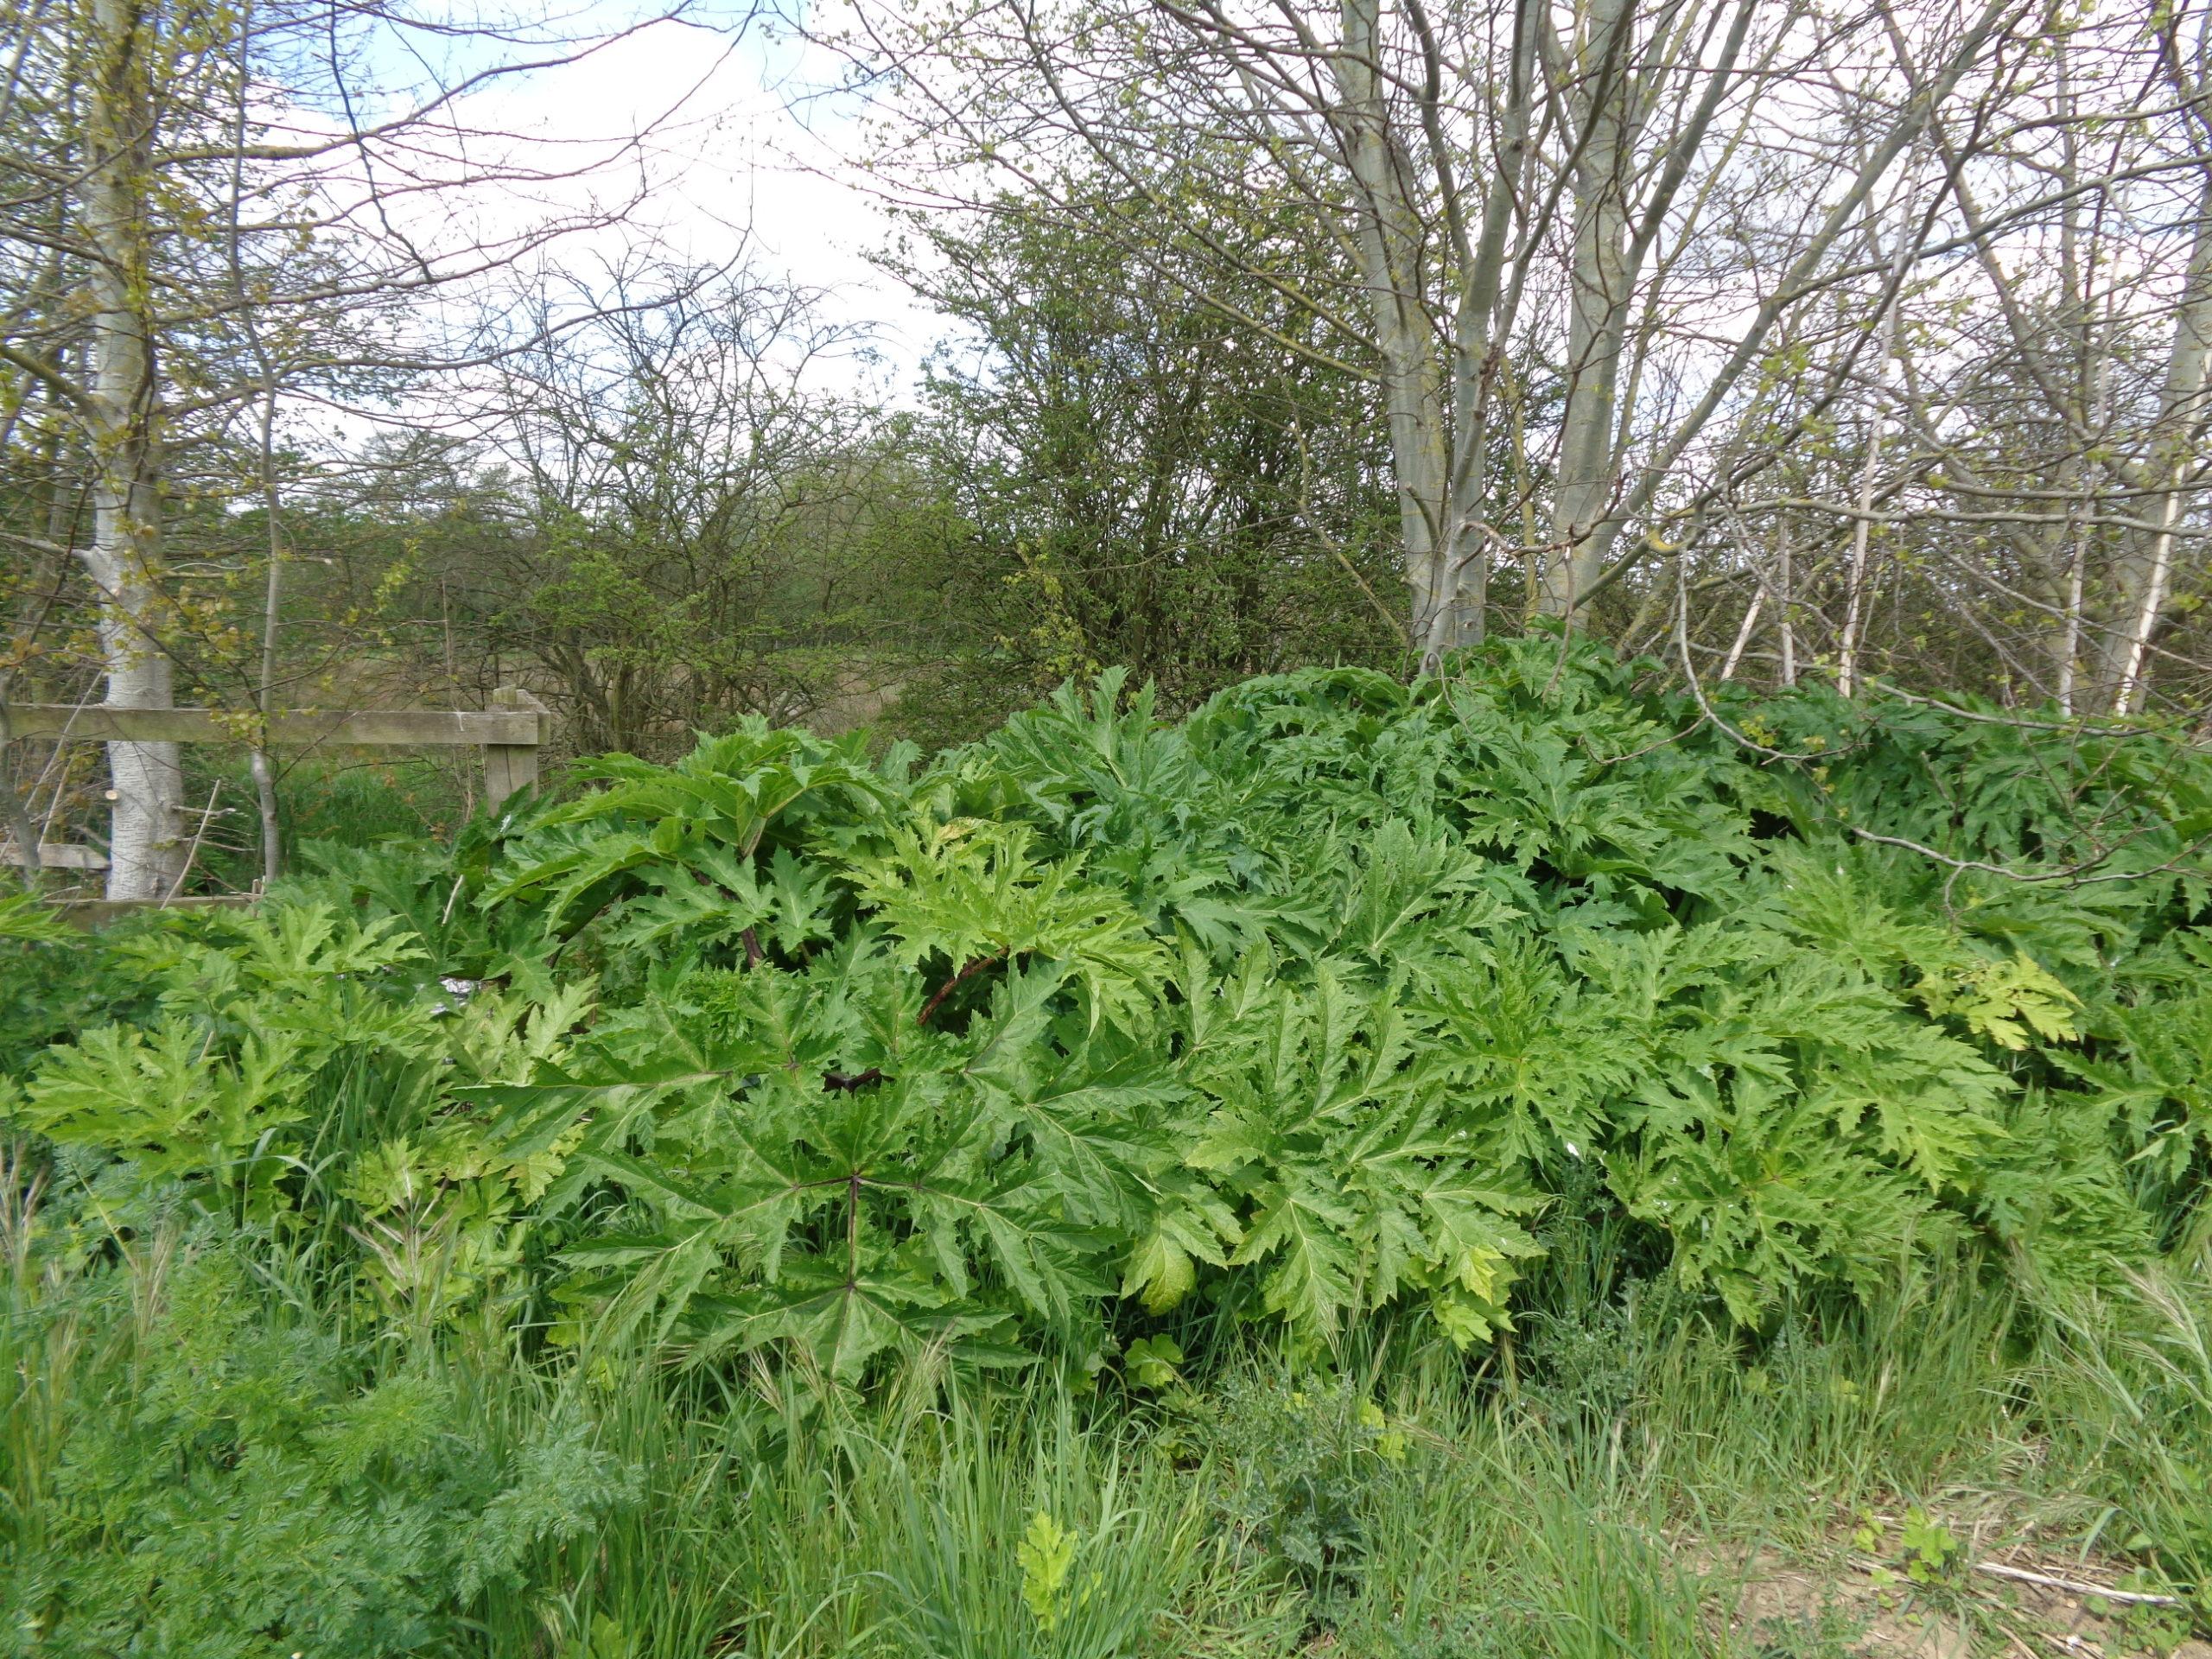 Giant hogweed spiky leaves